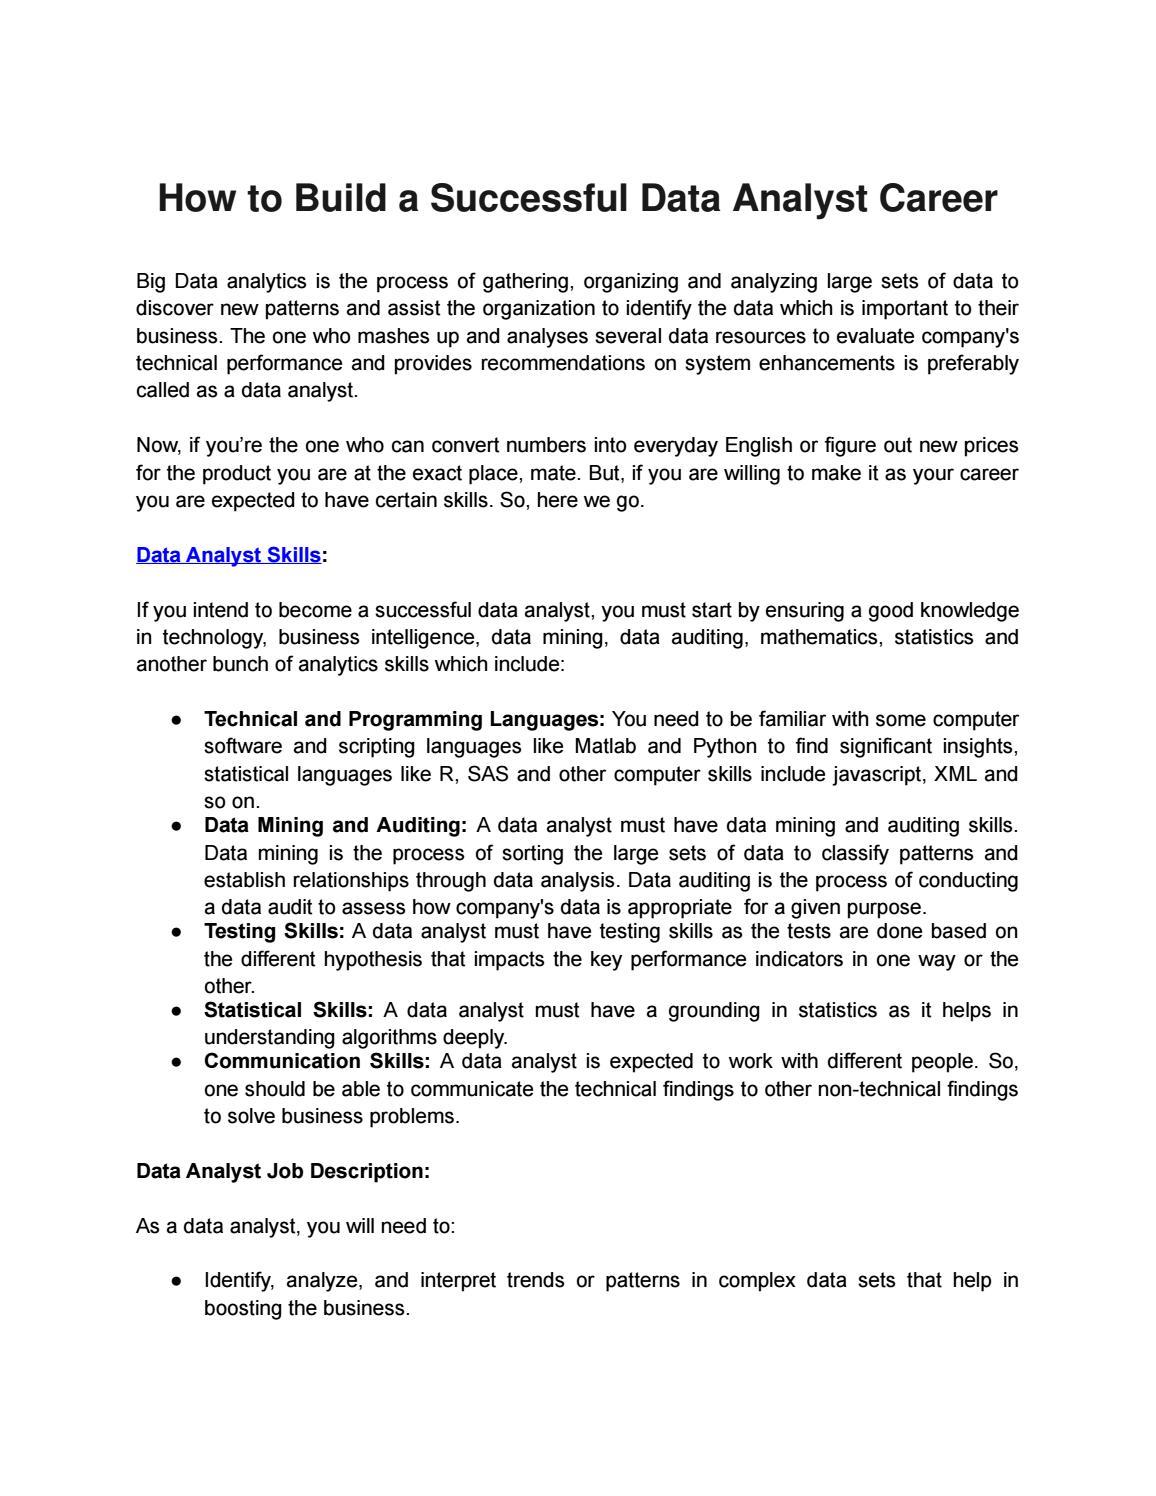 Big data analyst by EduPristine - issuu